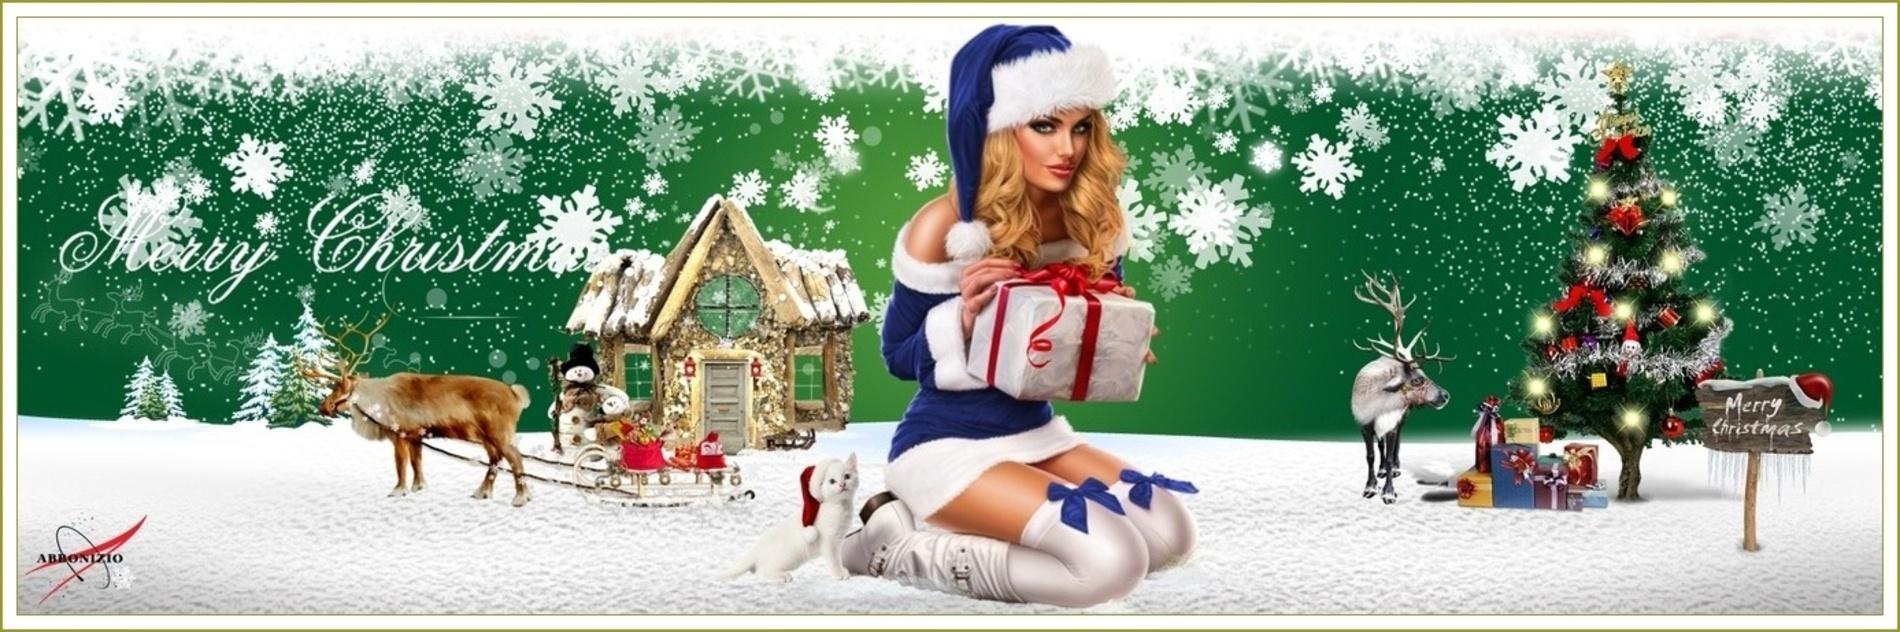 Buon Natale♥